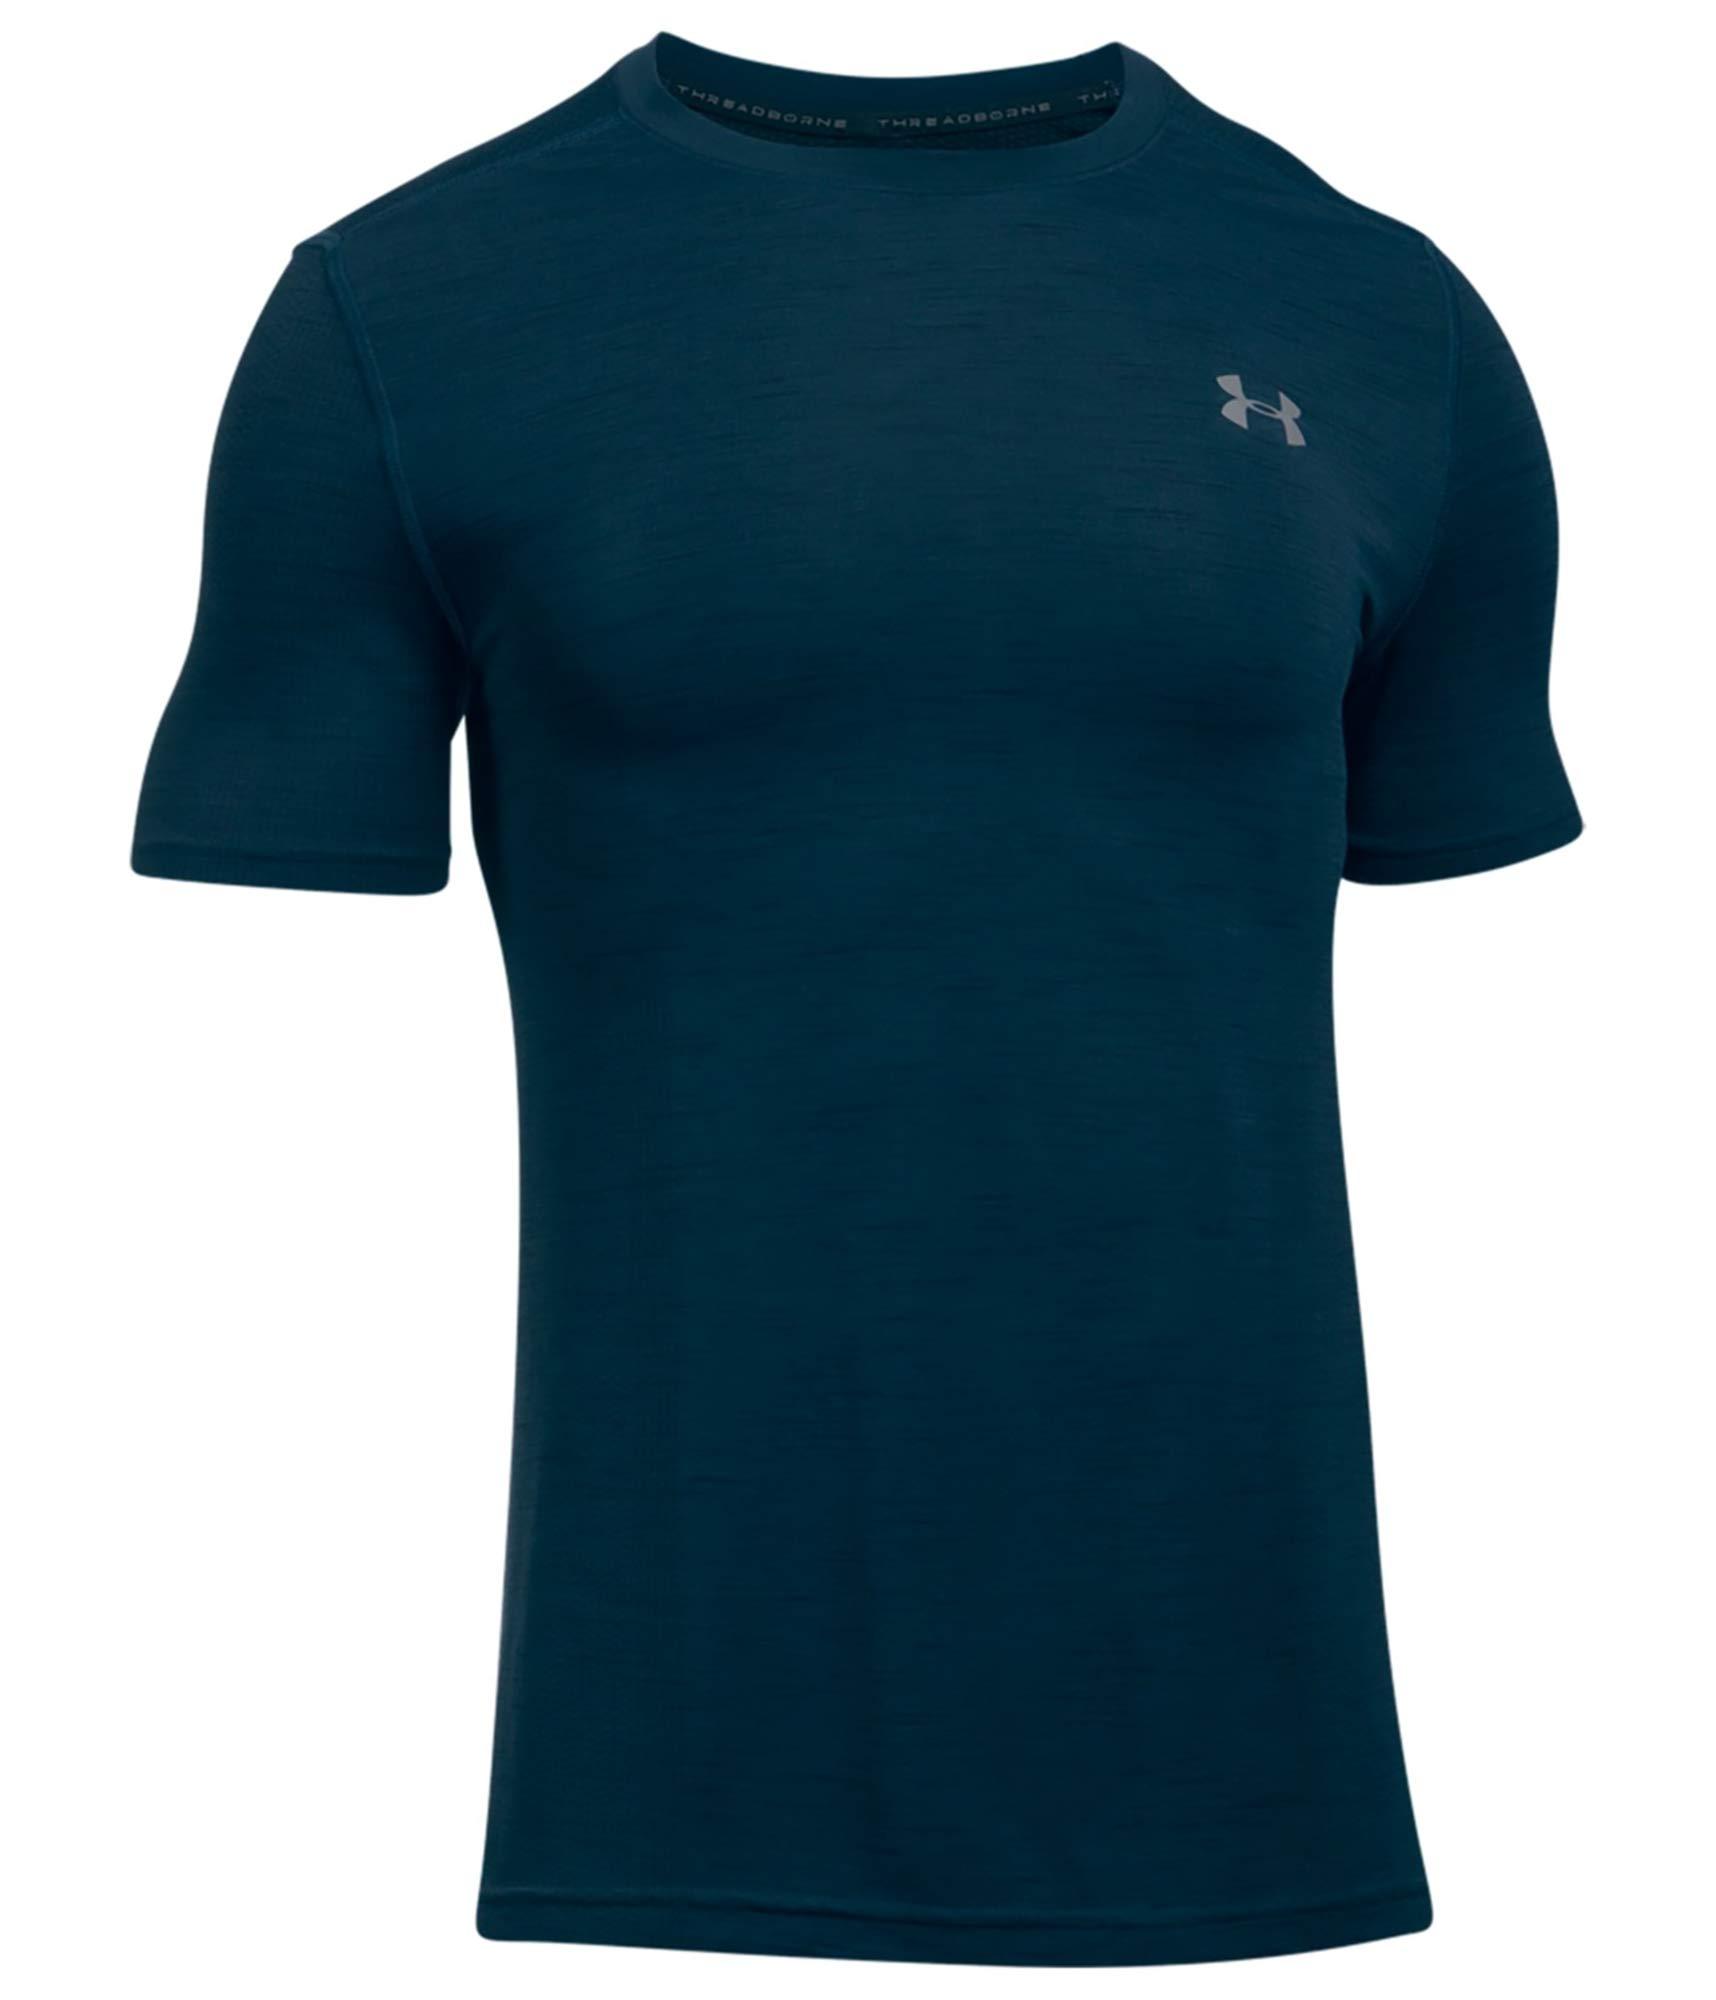 Under Armour Mens Threadborne Seamless T-Shirt,True Ink /Anthracite, Small